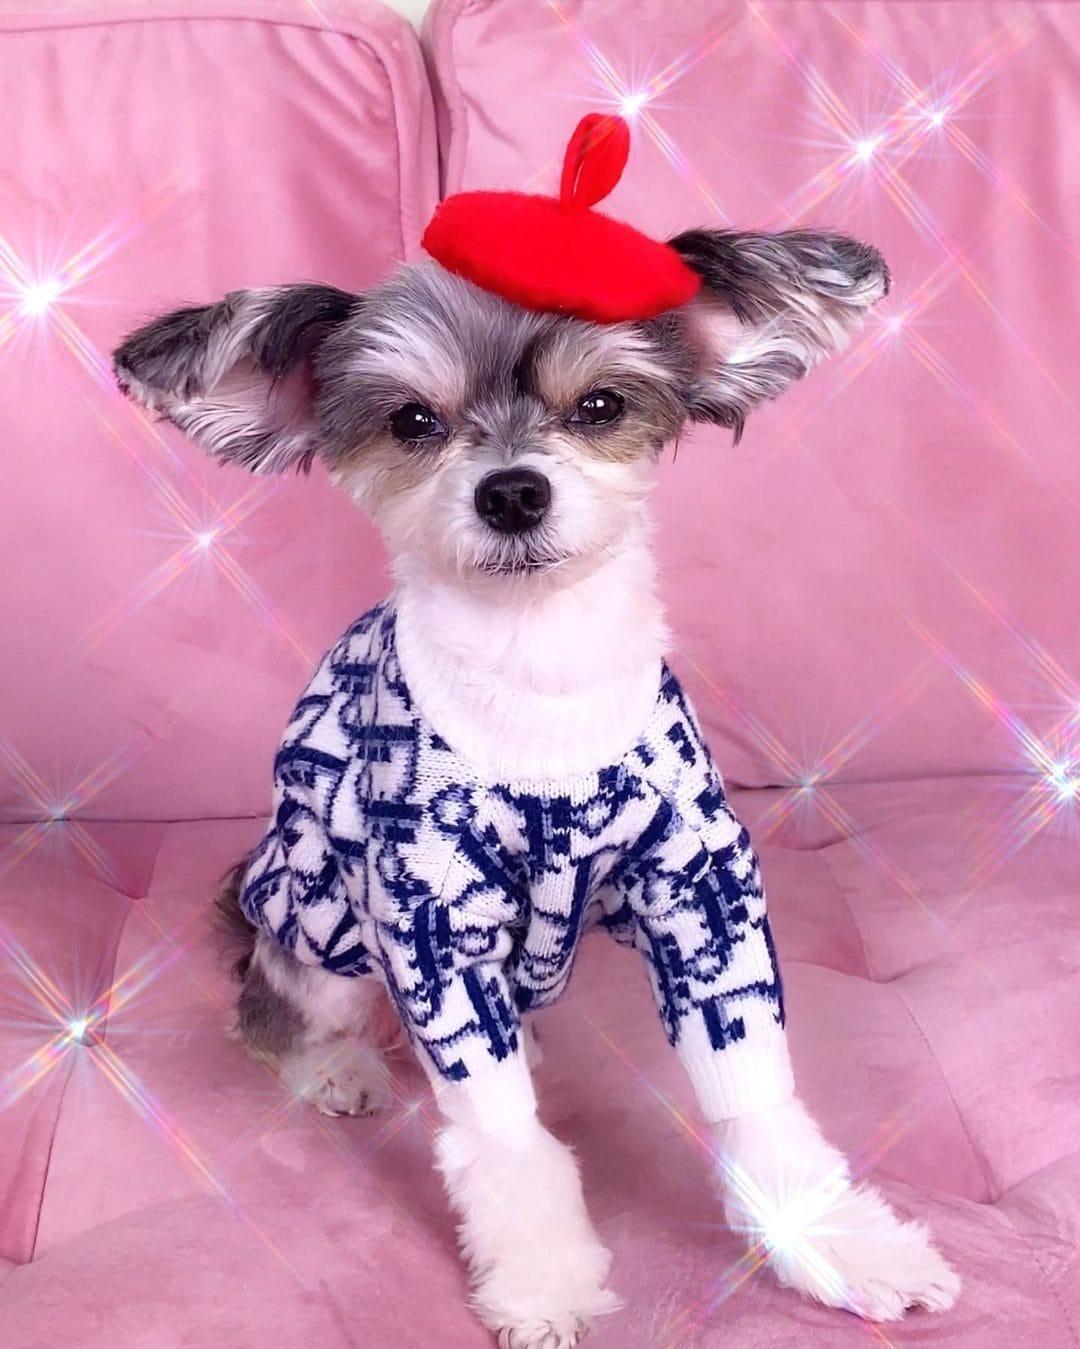 Tinkerbell in Dior su Instagram